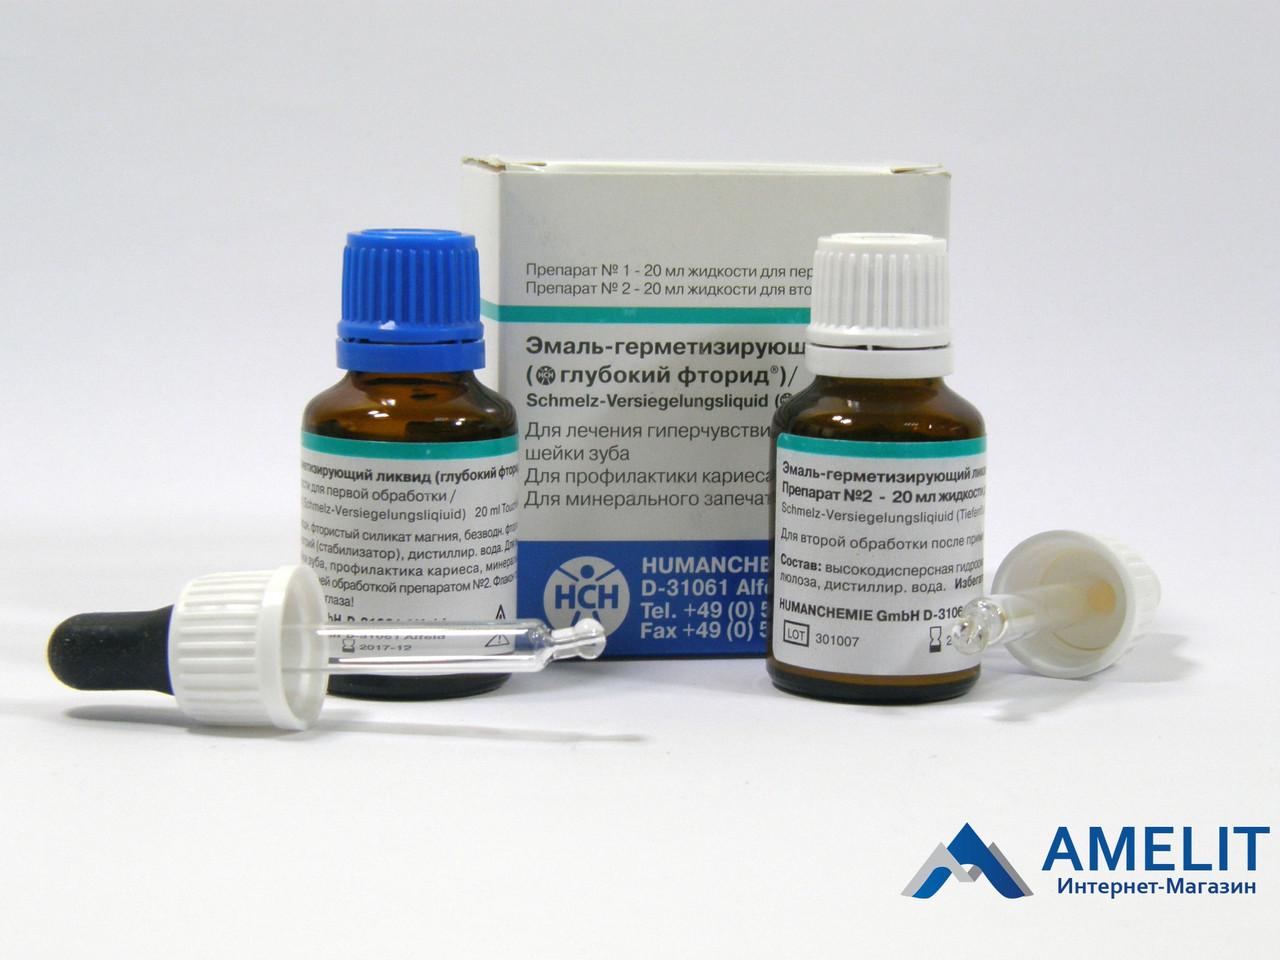 Эмаль-герметизирующий ликвид (Humanchemie), глубокий фторид, 2x5мл